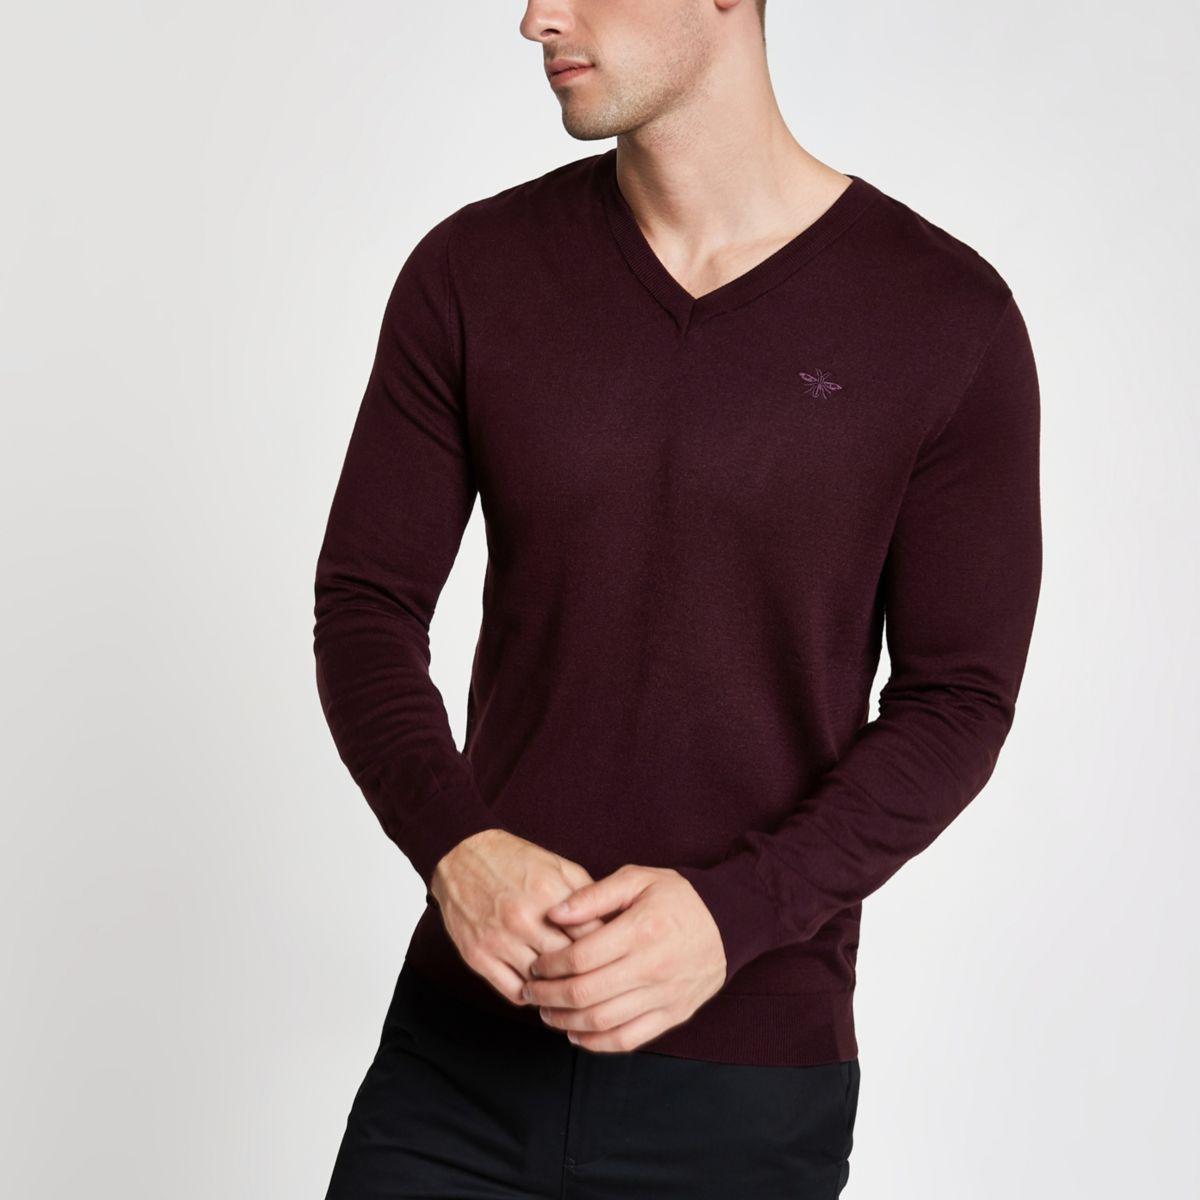 Dunkelroter Slim Fit Pullover mit V-Ausschnitt